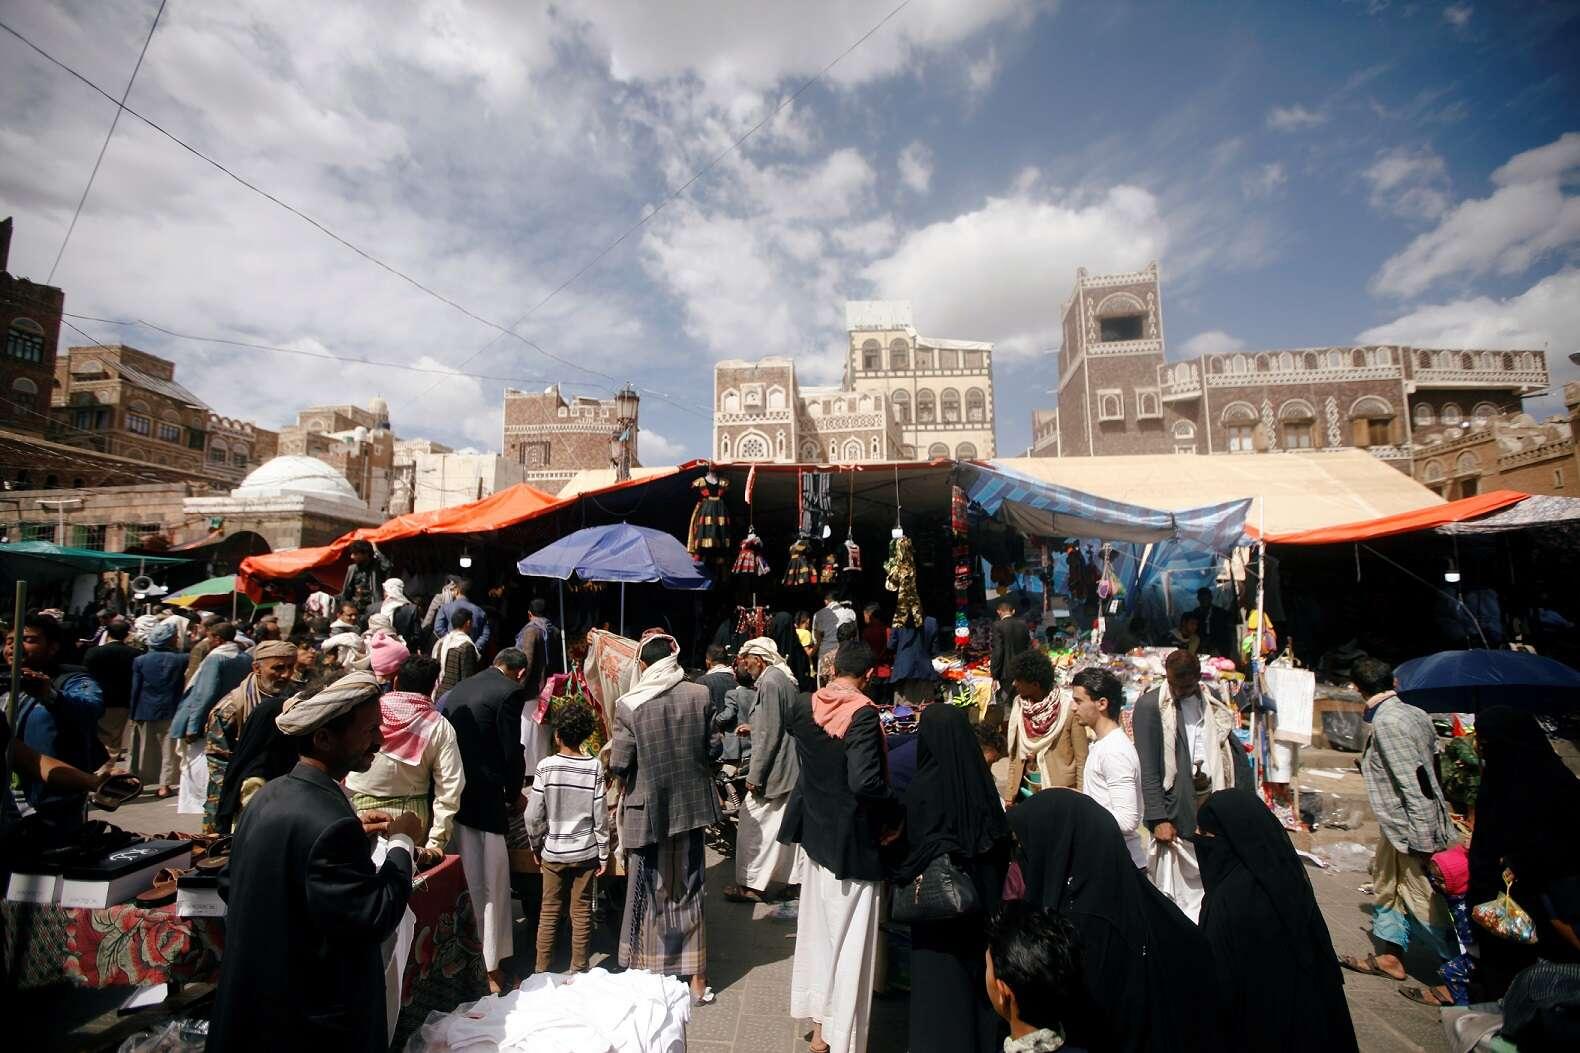 Arab views on homosexuality